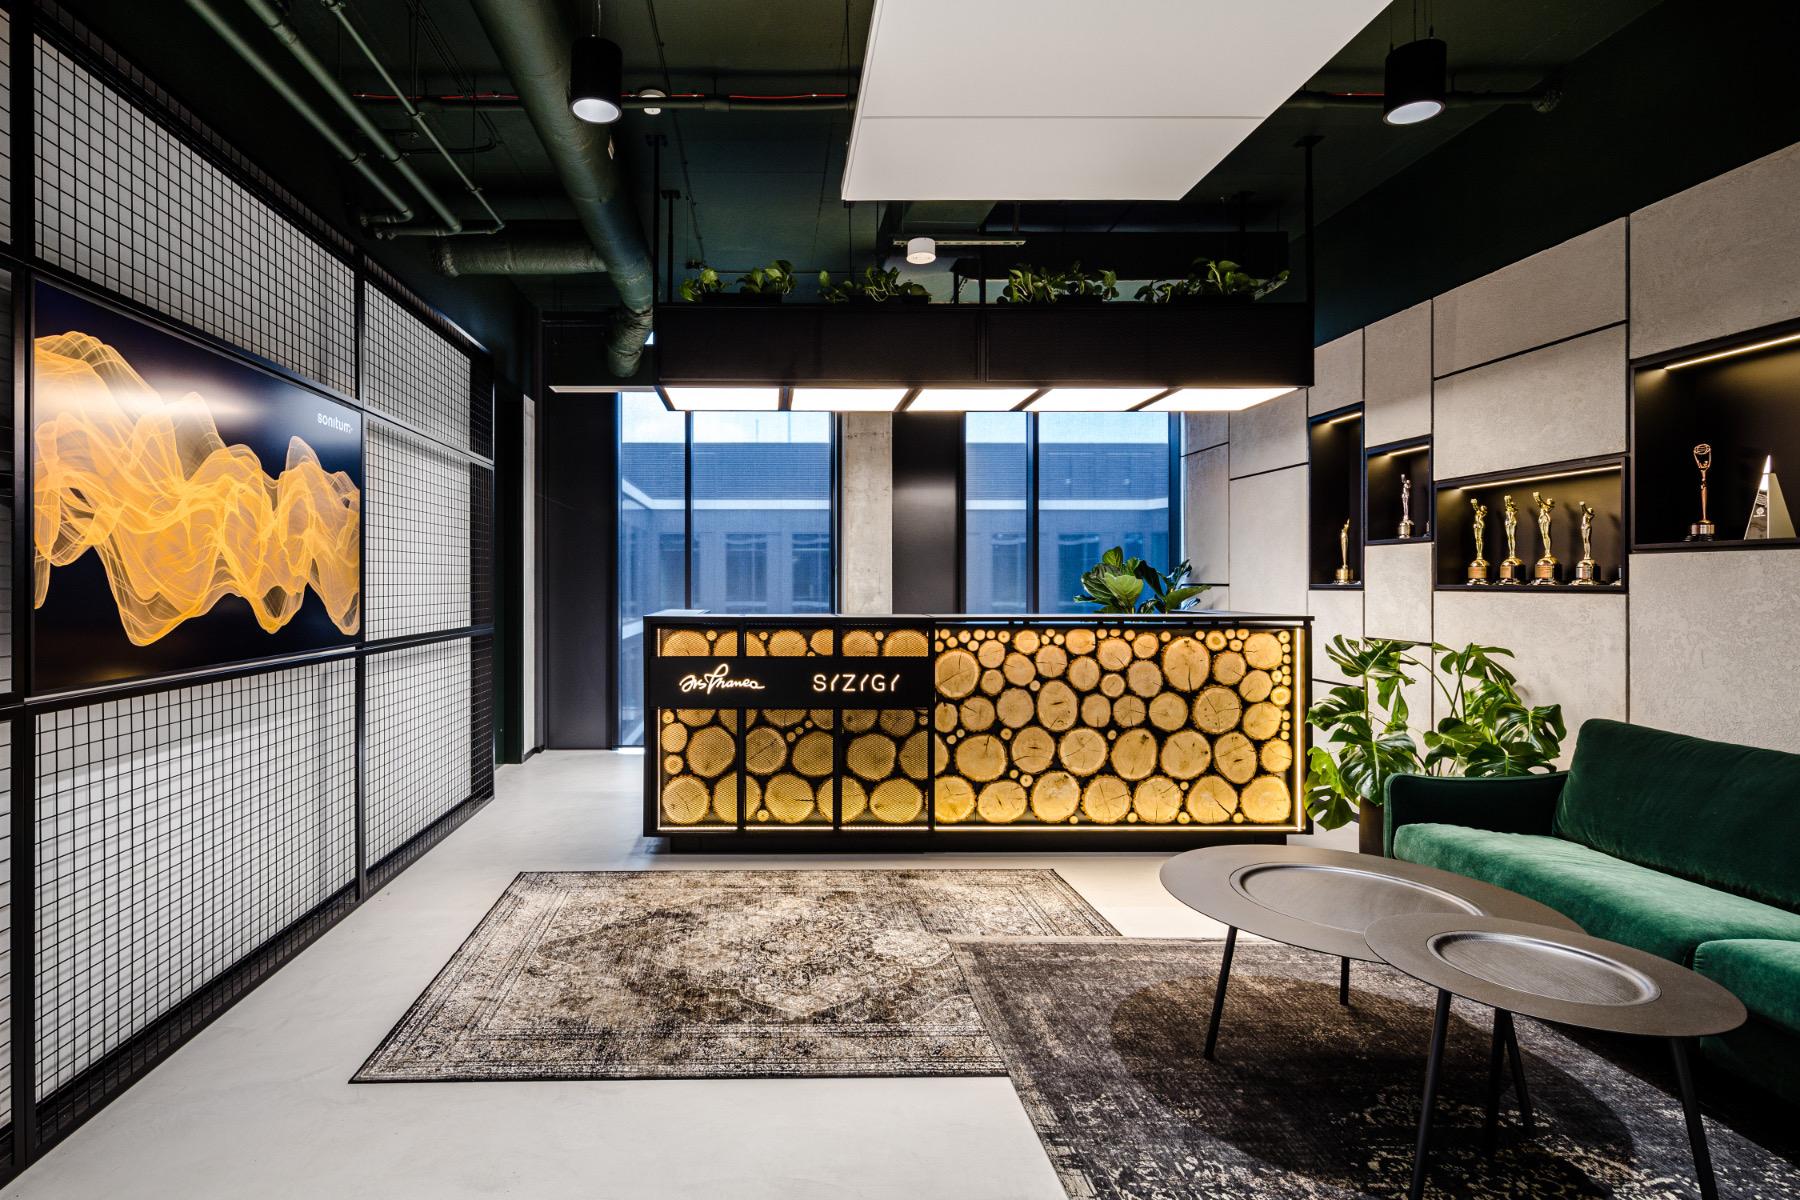 syzygy-warsaw-office-1